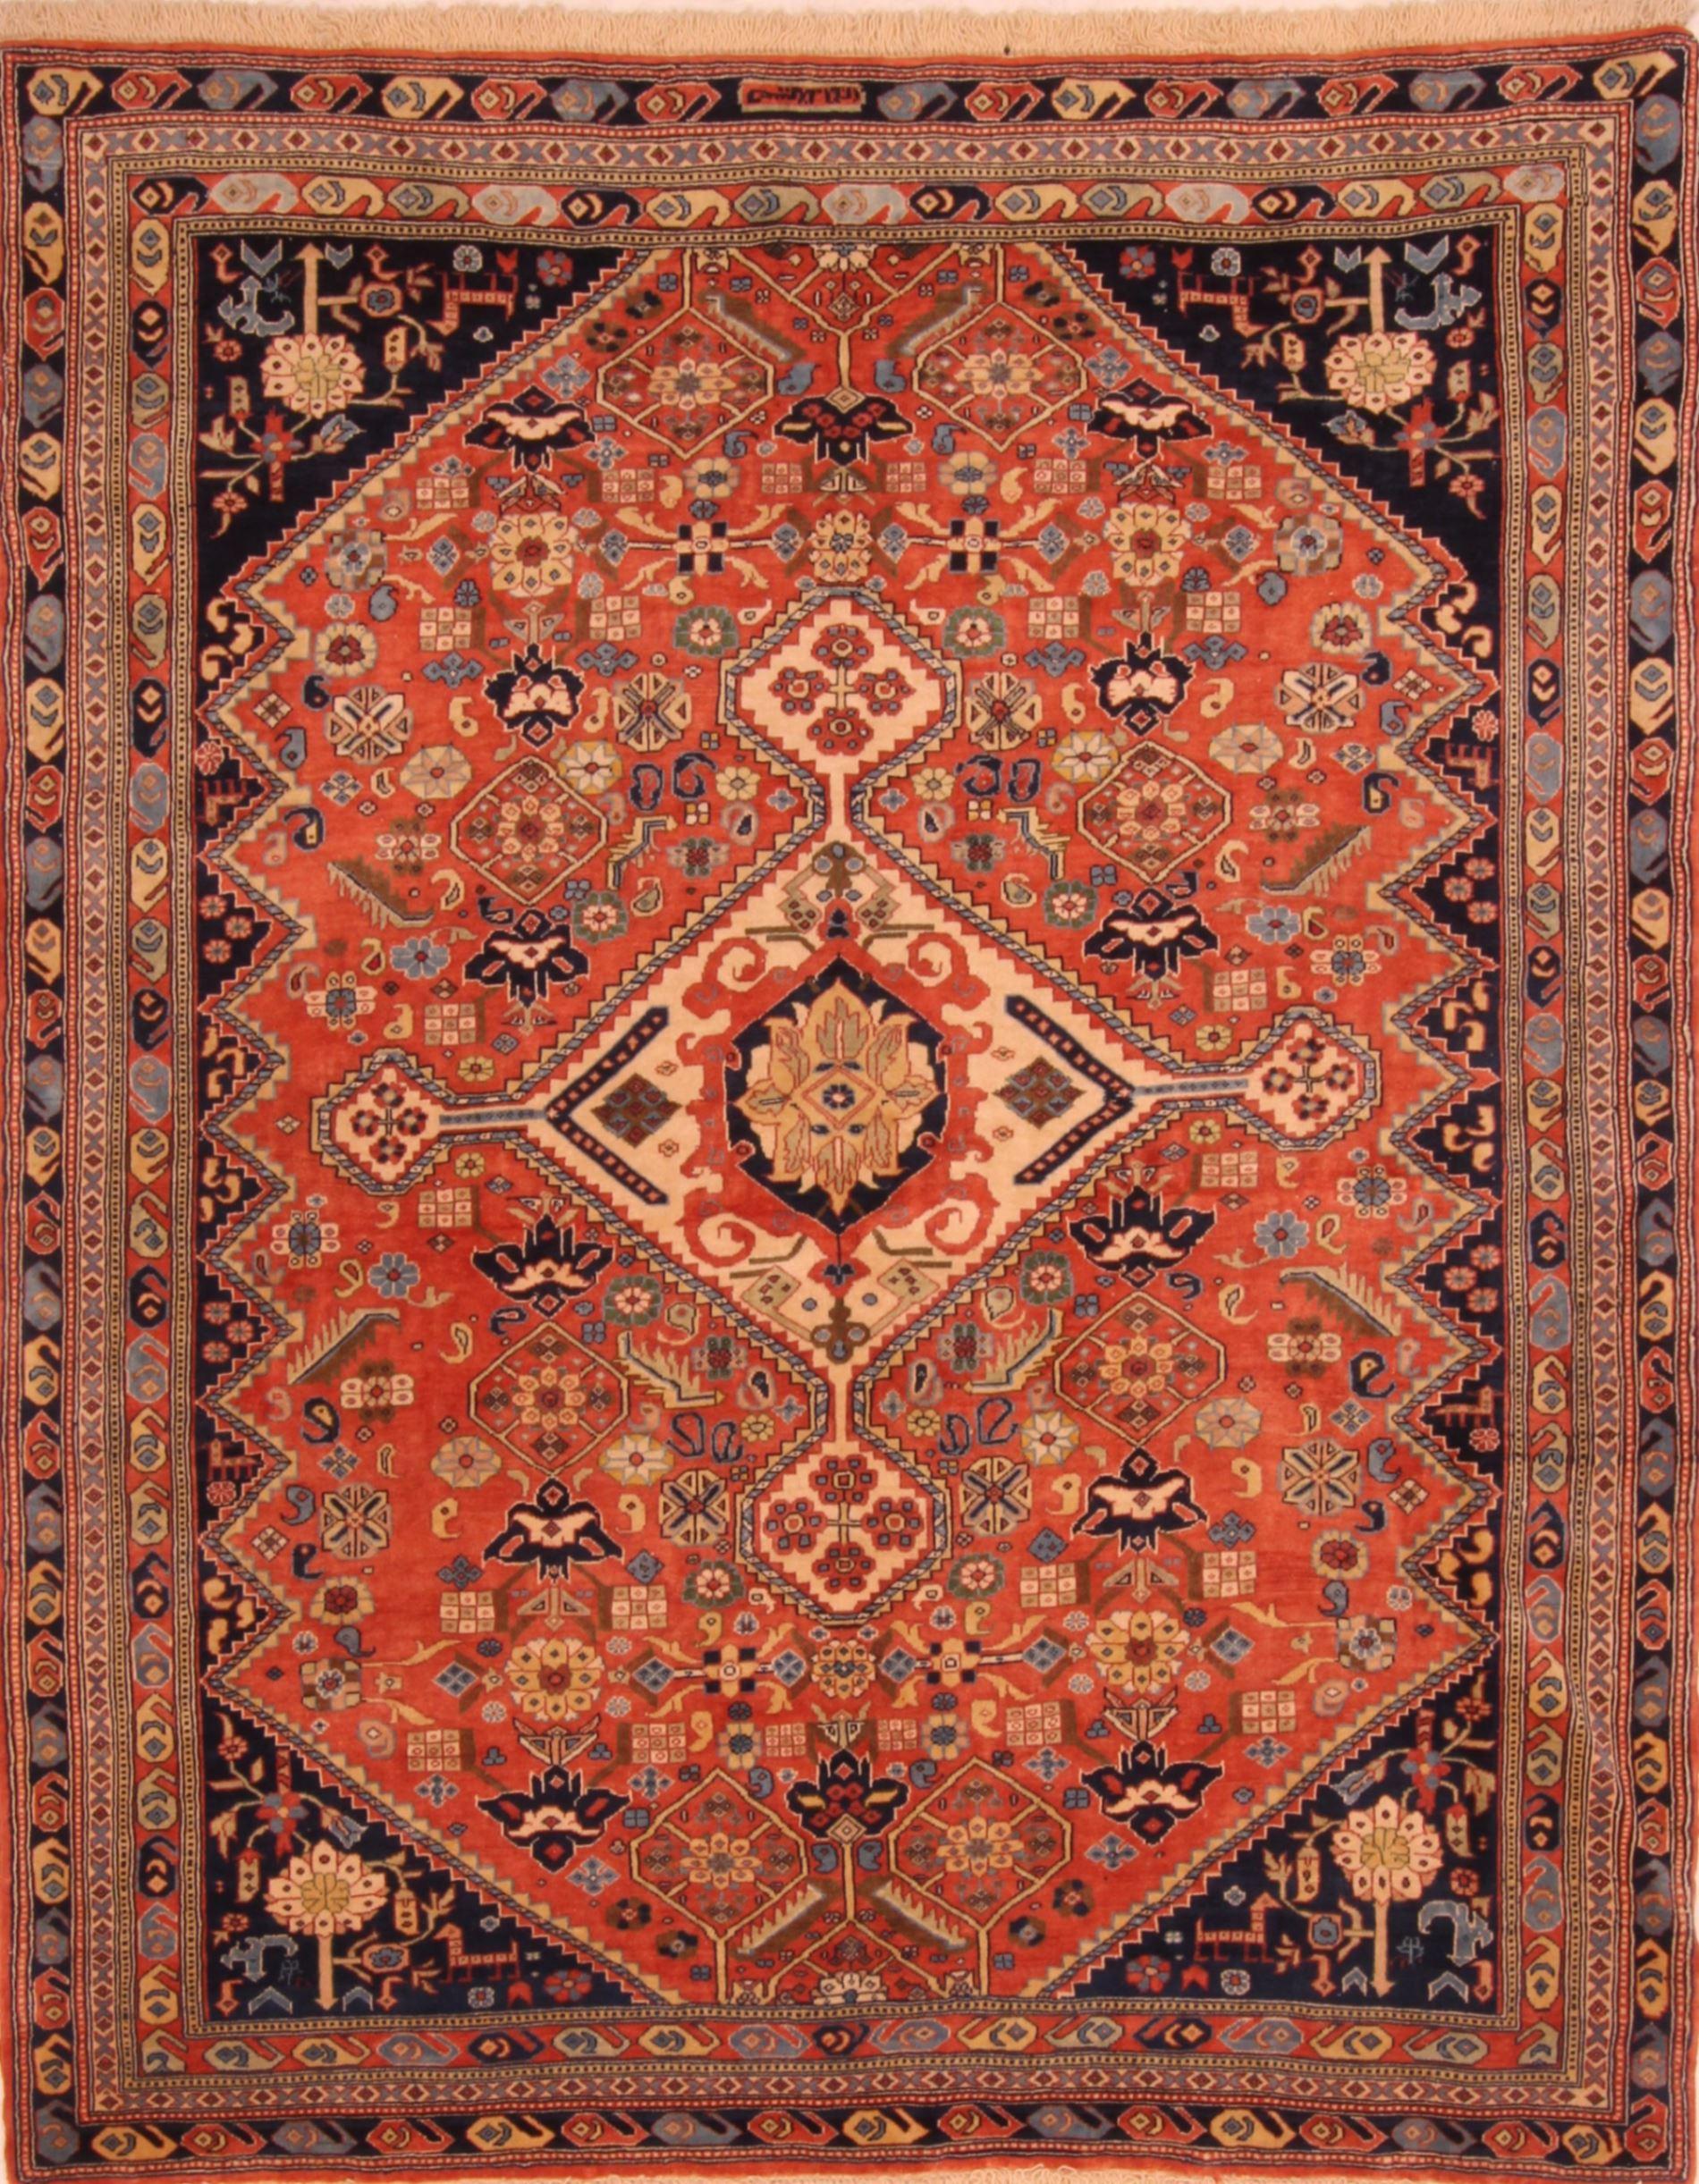 Persian Ghashghaei Red Rectangle 5x7 Ft Wool Carpet 27726 Area Rug